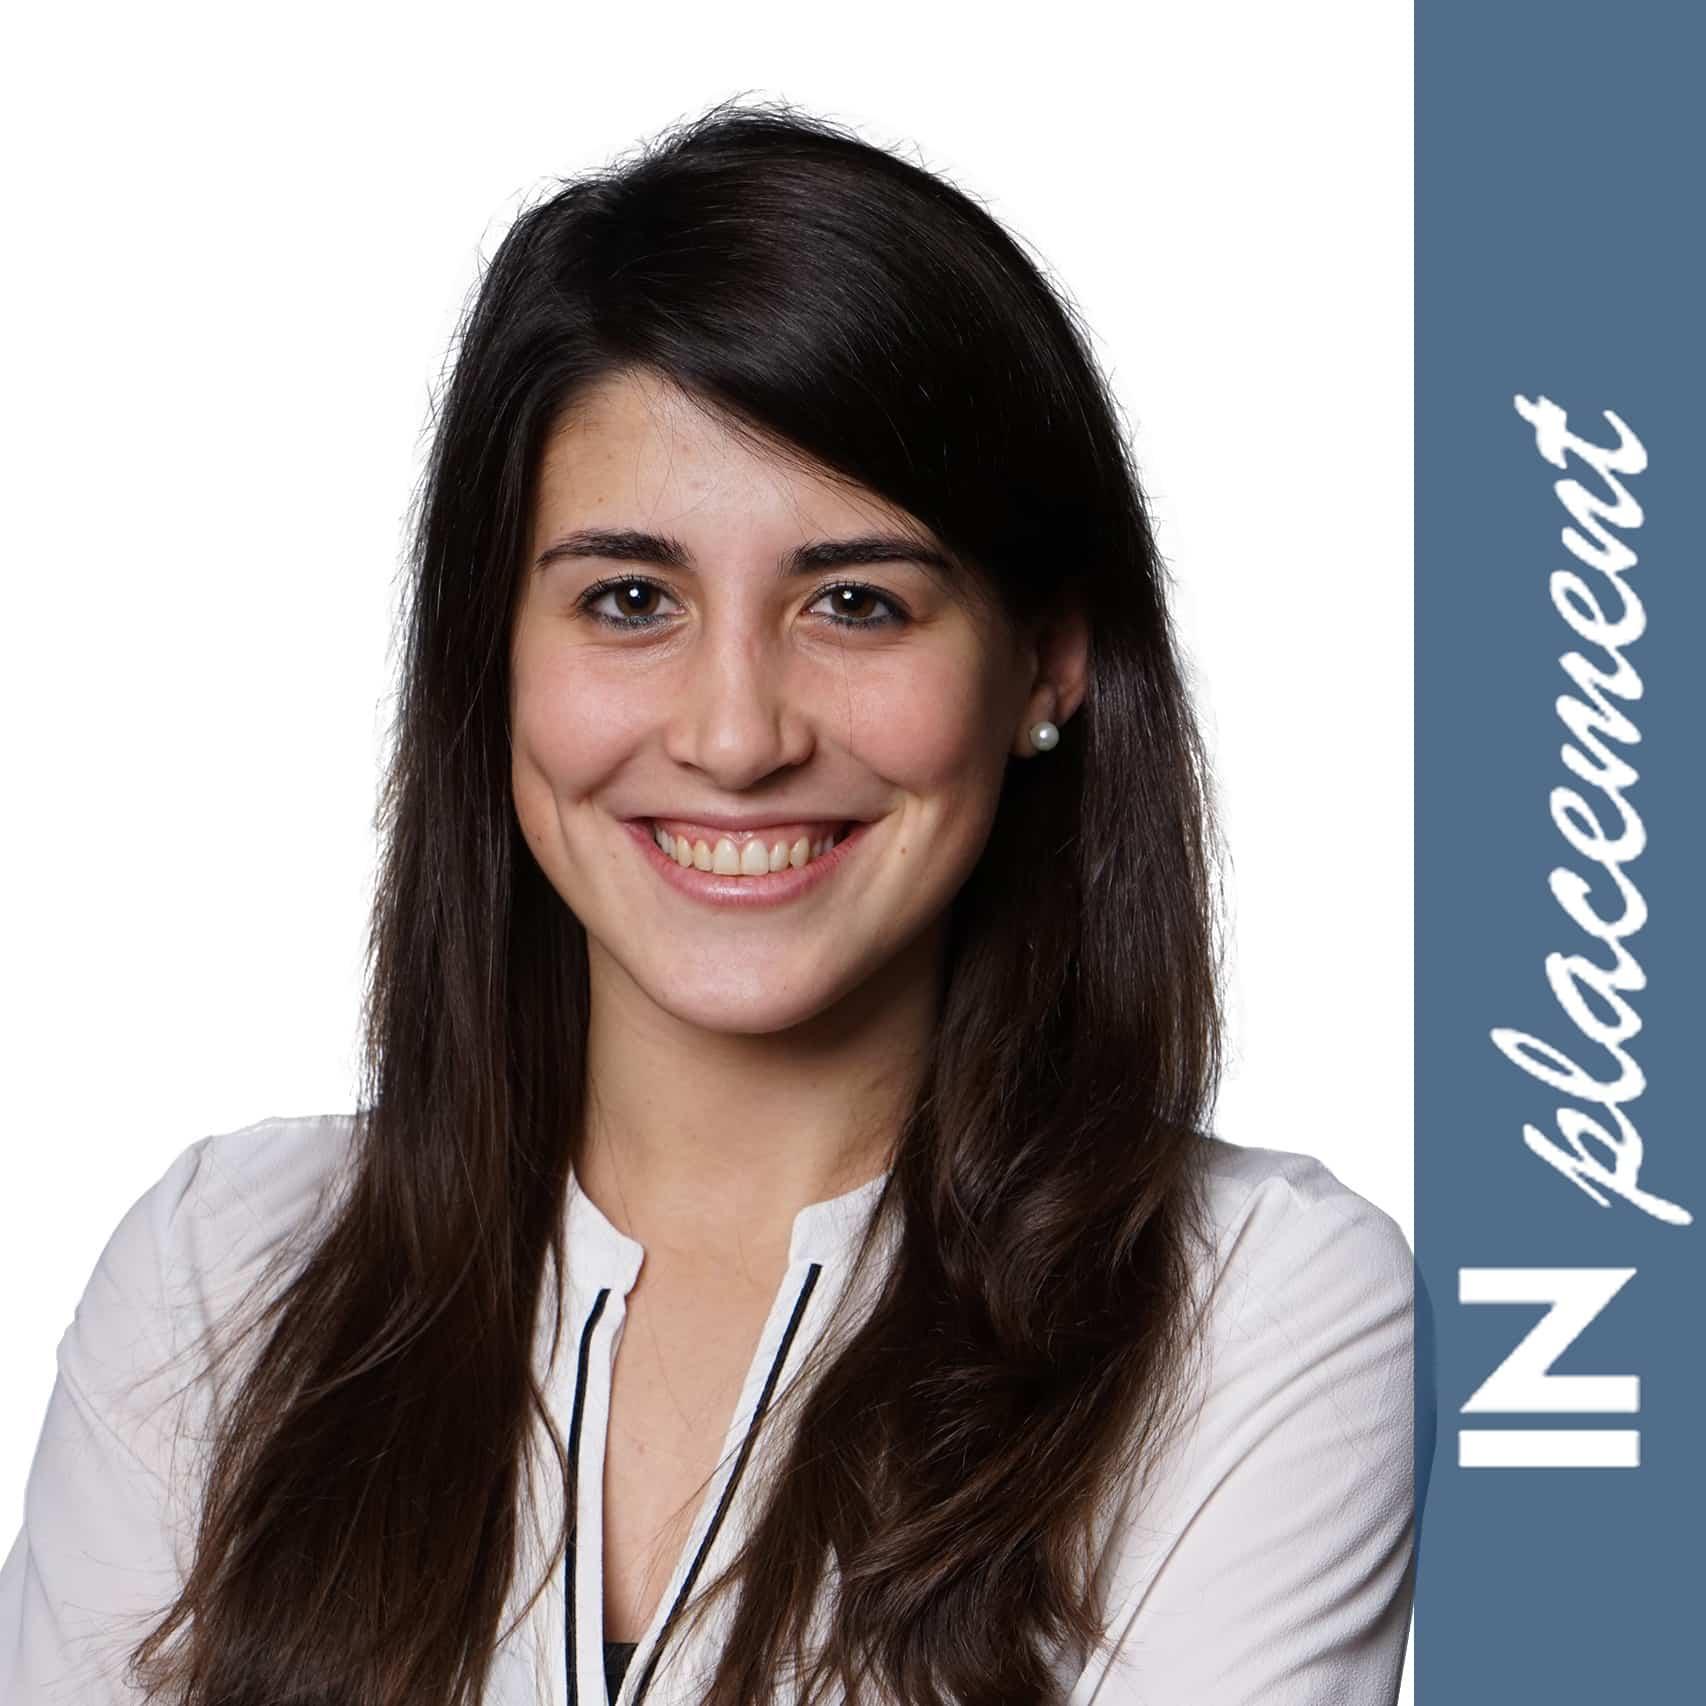 Francesca Malberti